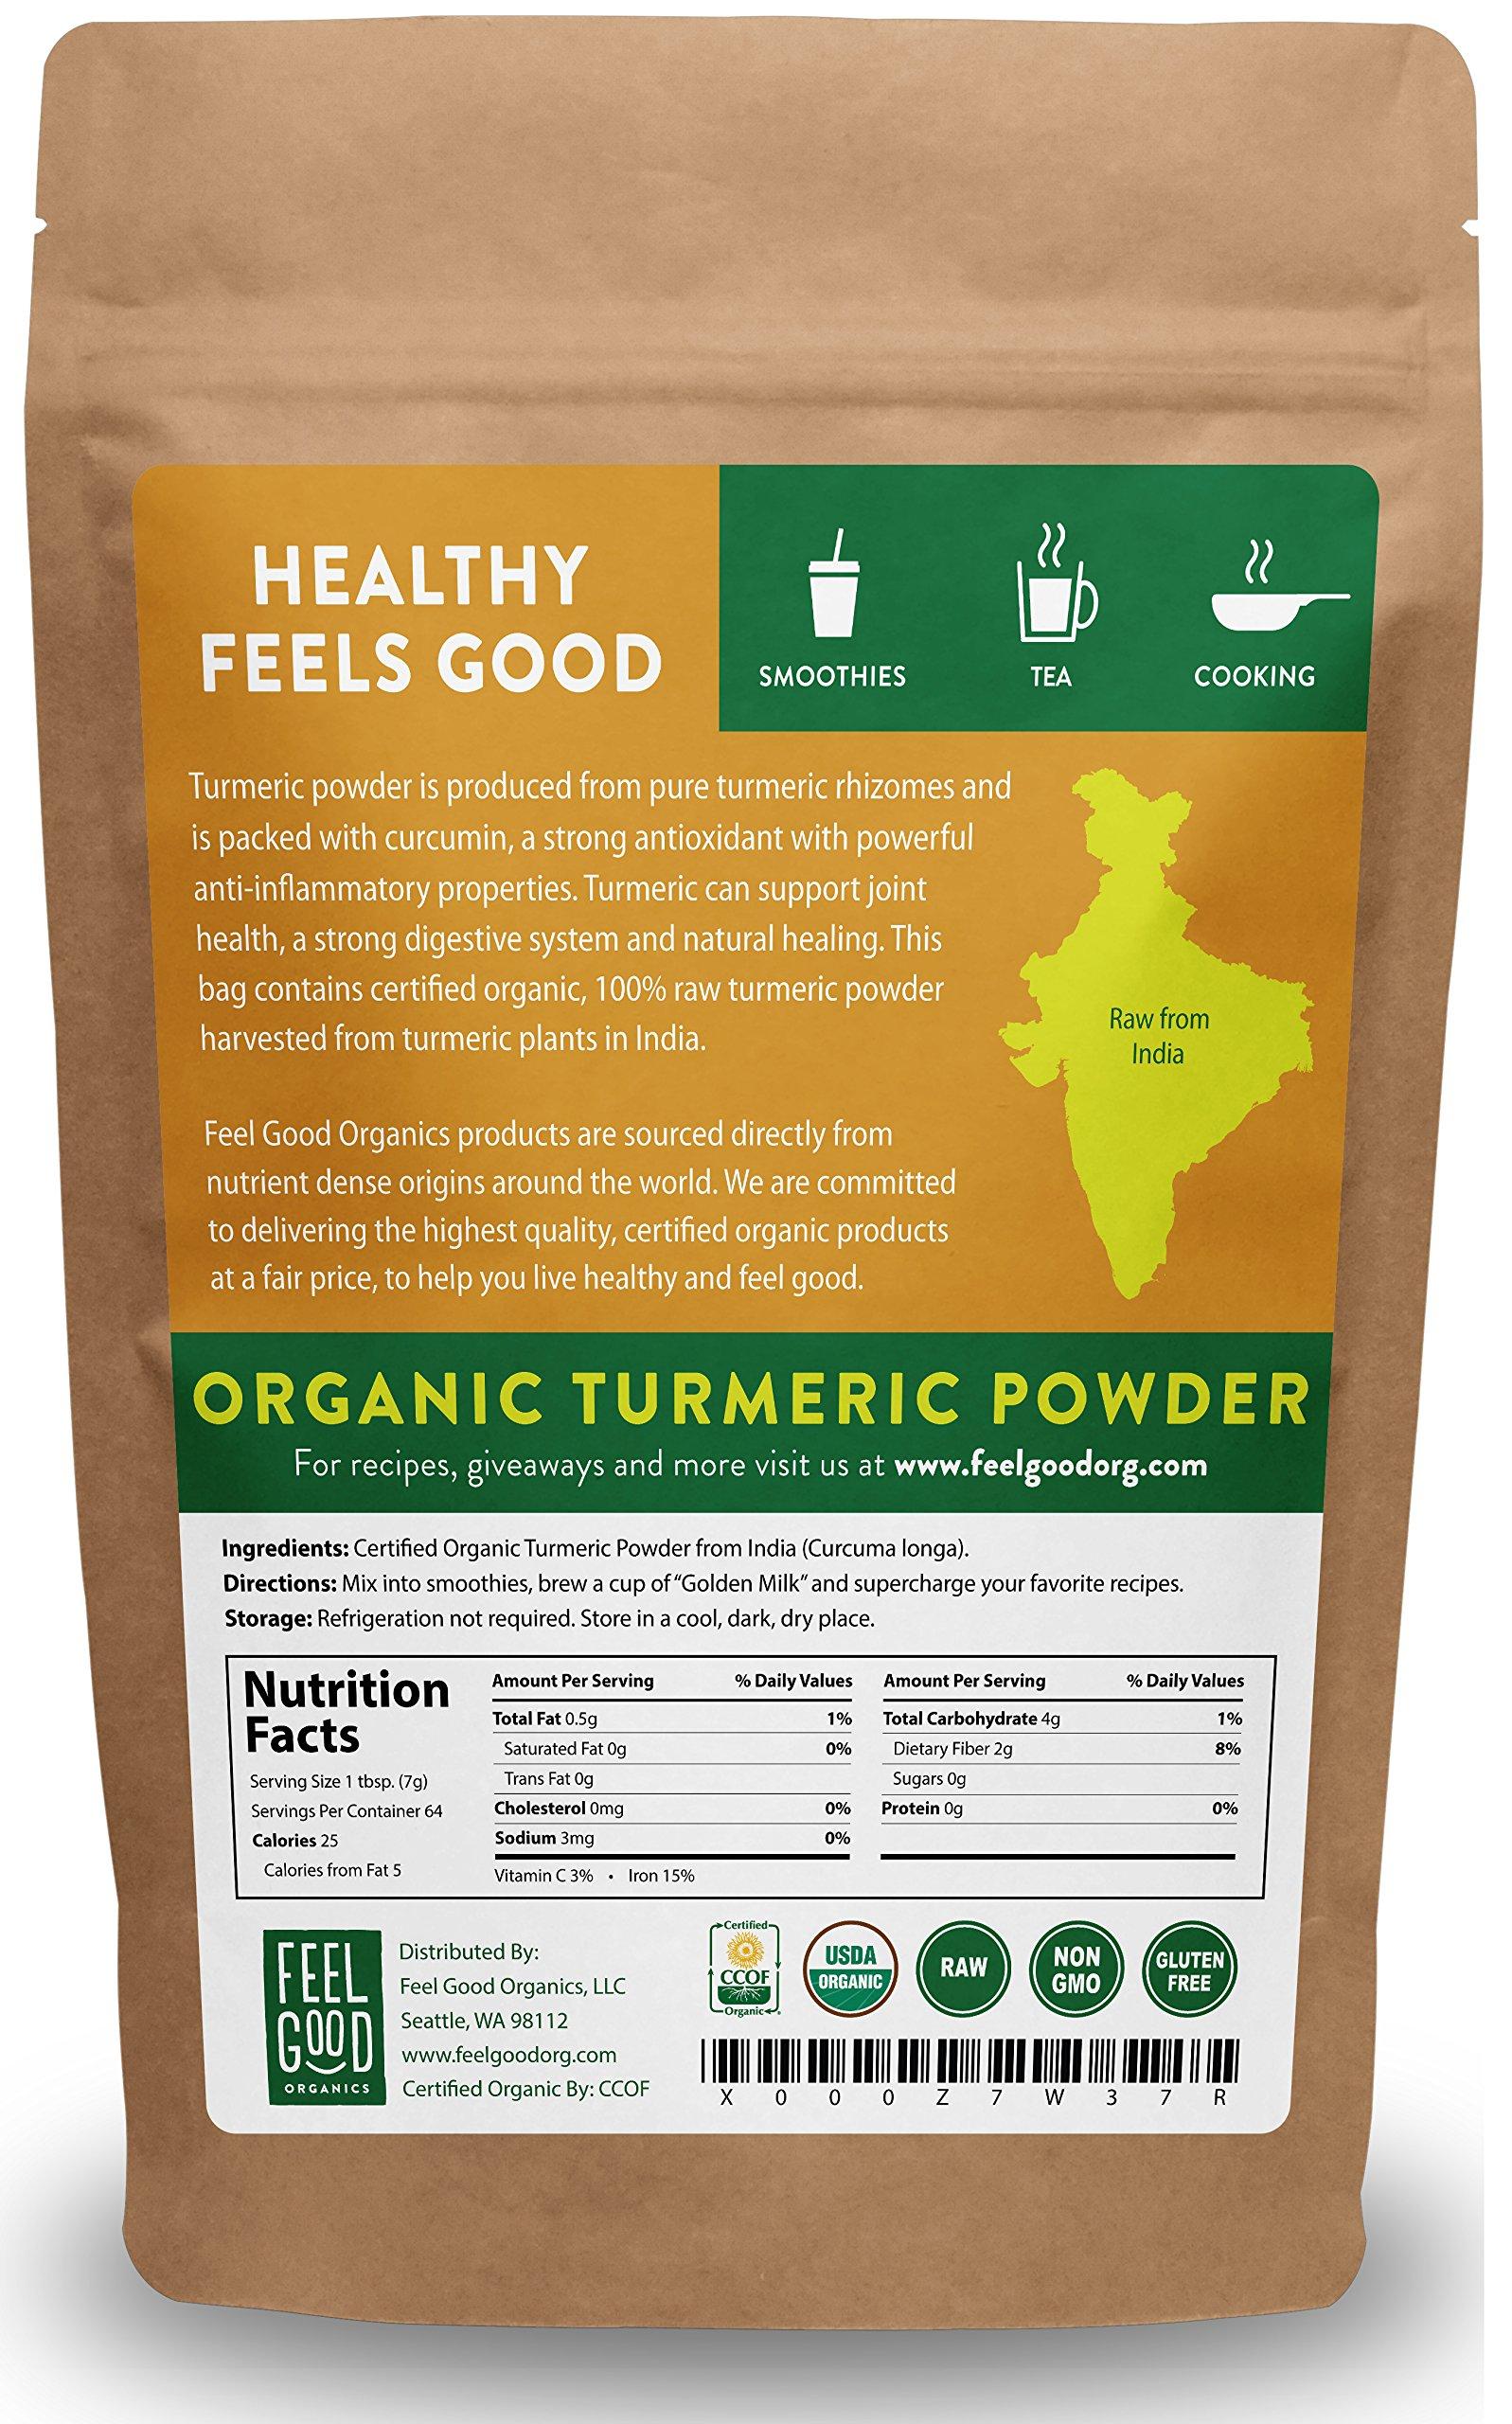 Organic Turmeric Root Powder - 16oz Resealable Bag (1lb) - 100% Raw w/Curcumin From India - by Feel Good Organics by Feel Good Organics (Image #1)